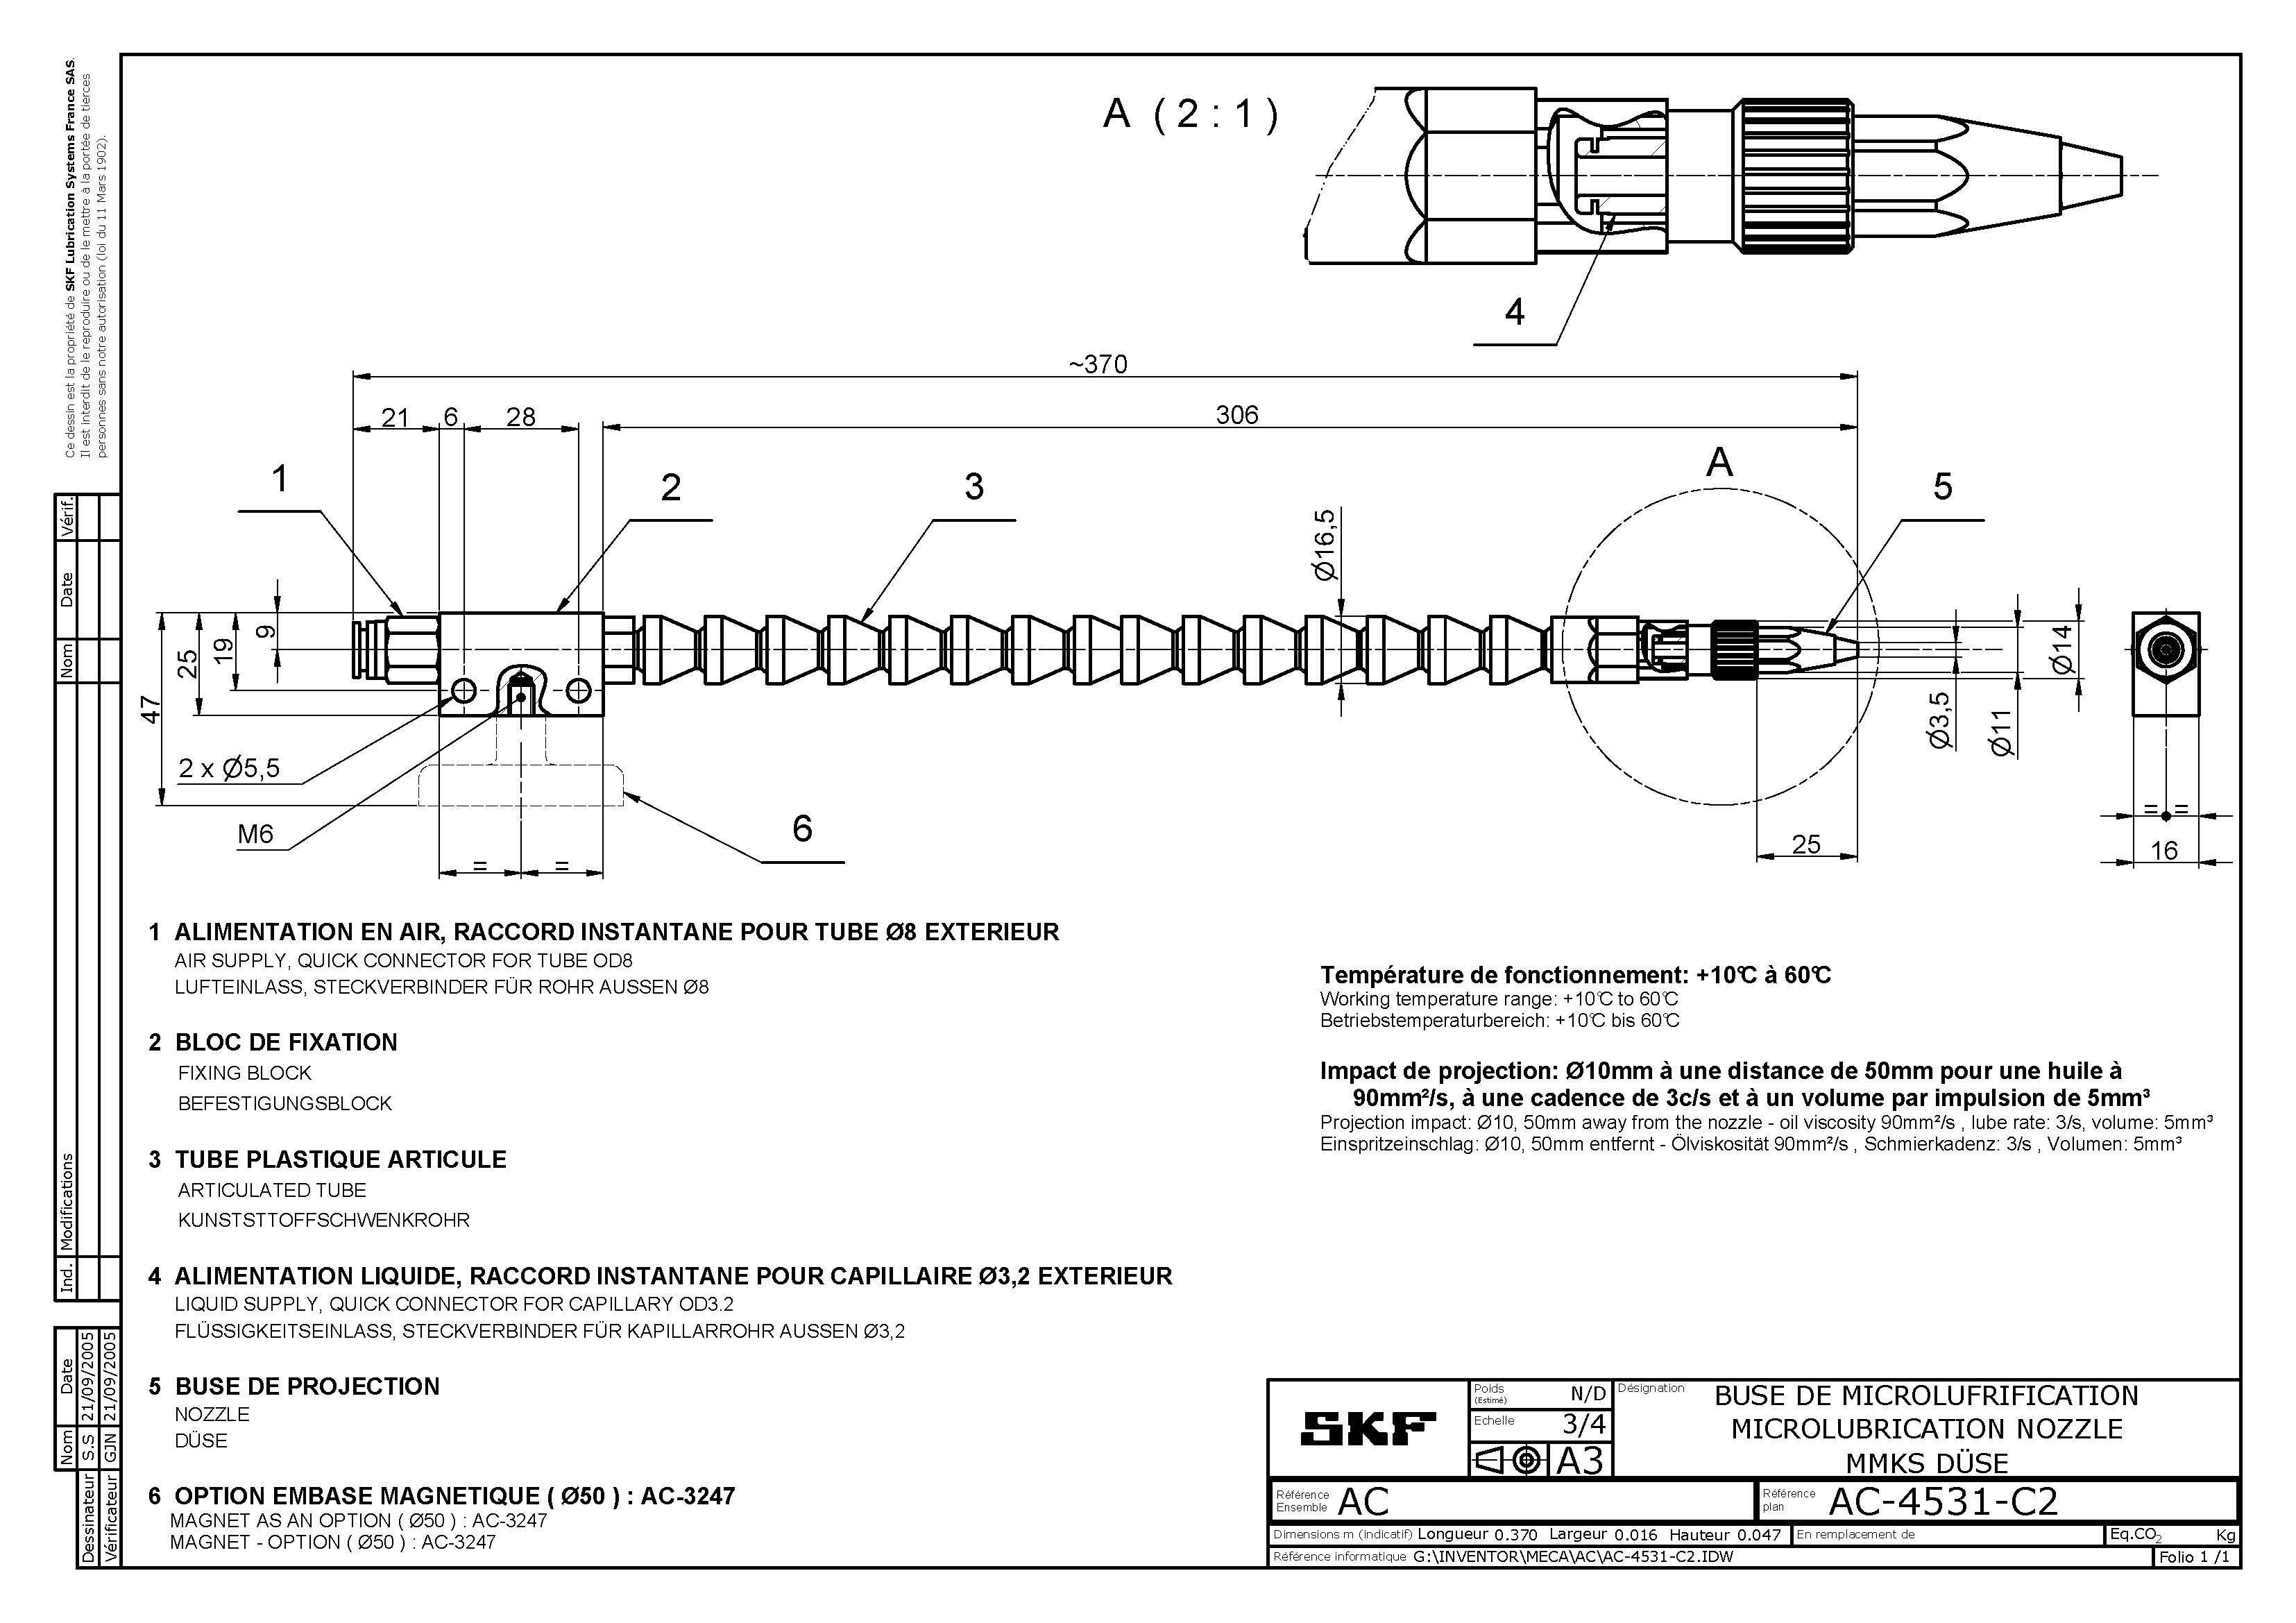 AC-4531-C2.jpg